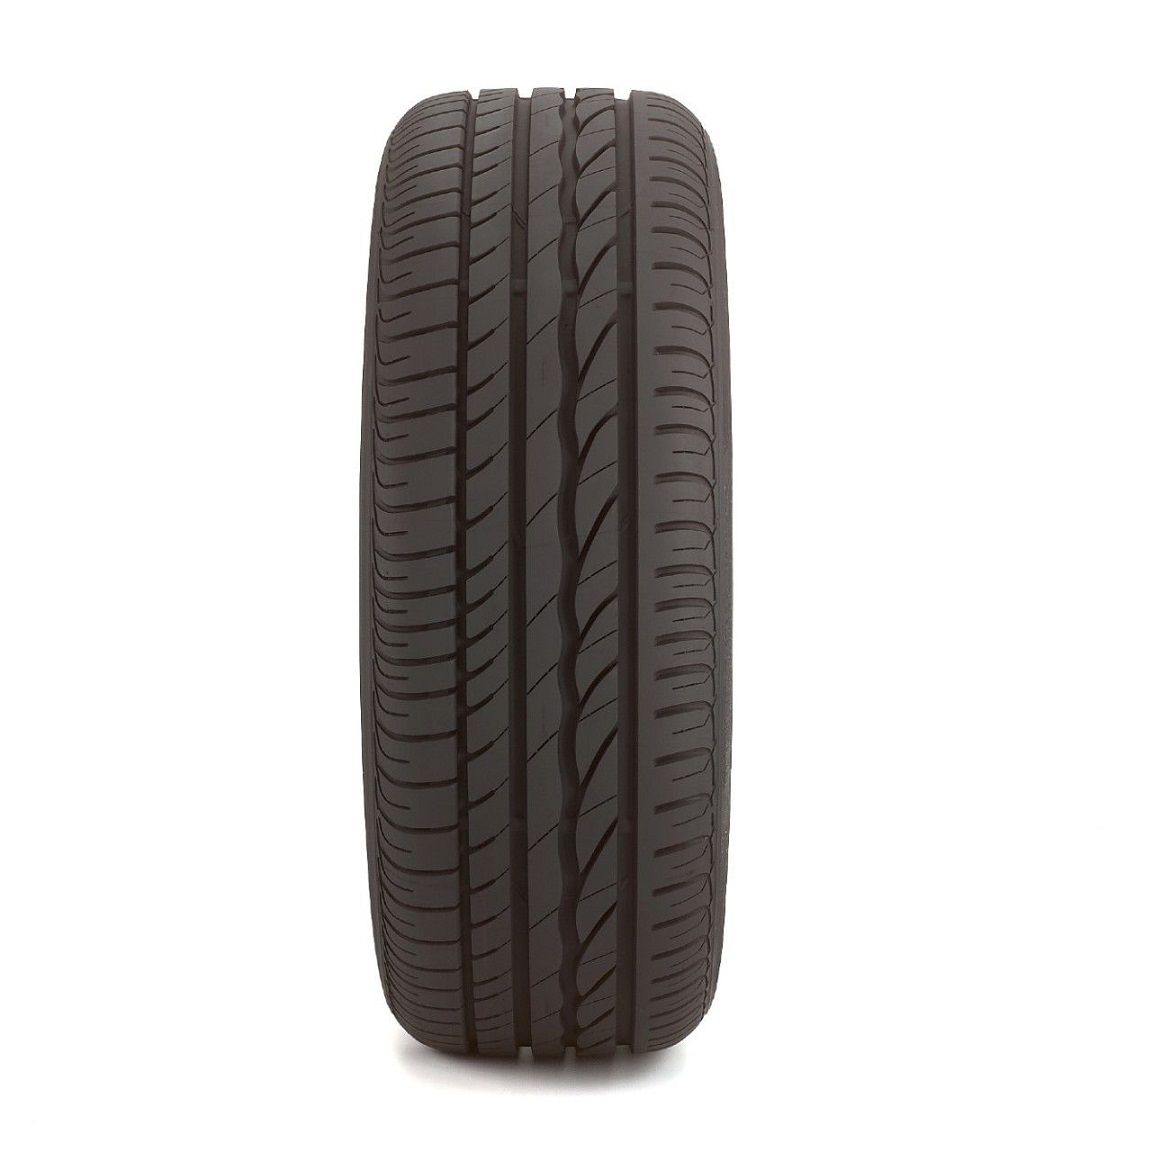 Pneu 185/55 R 16 - Turanza Er300 83v Bridgestone - Fit City